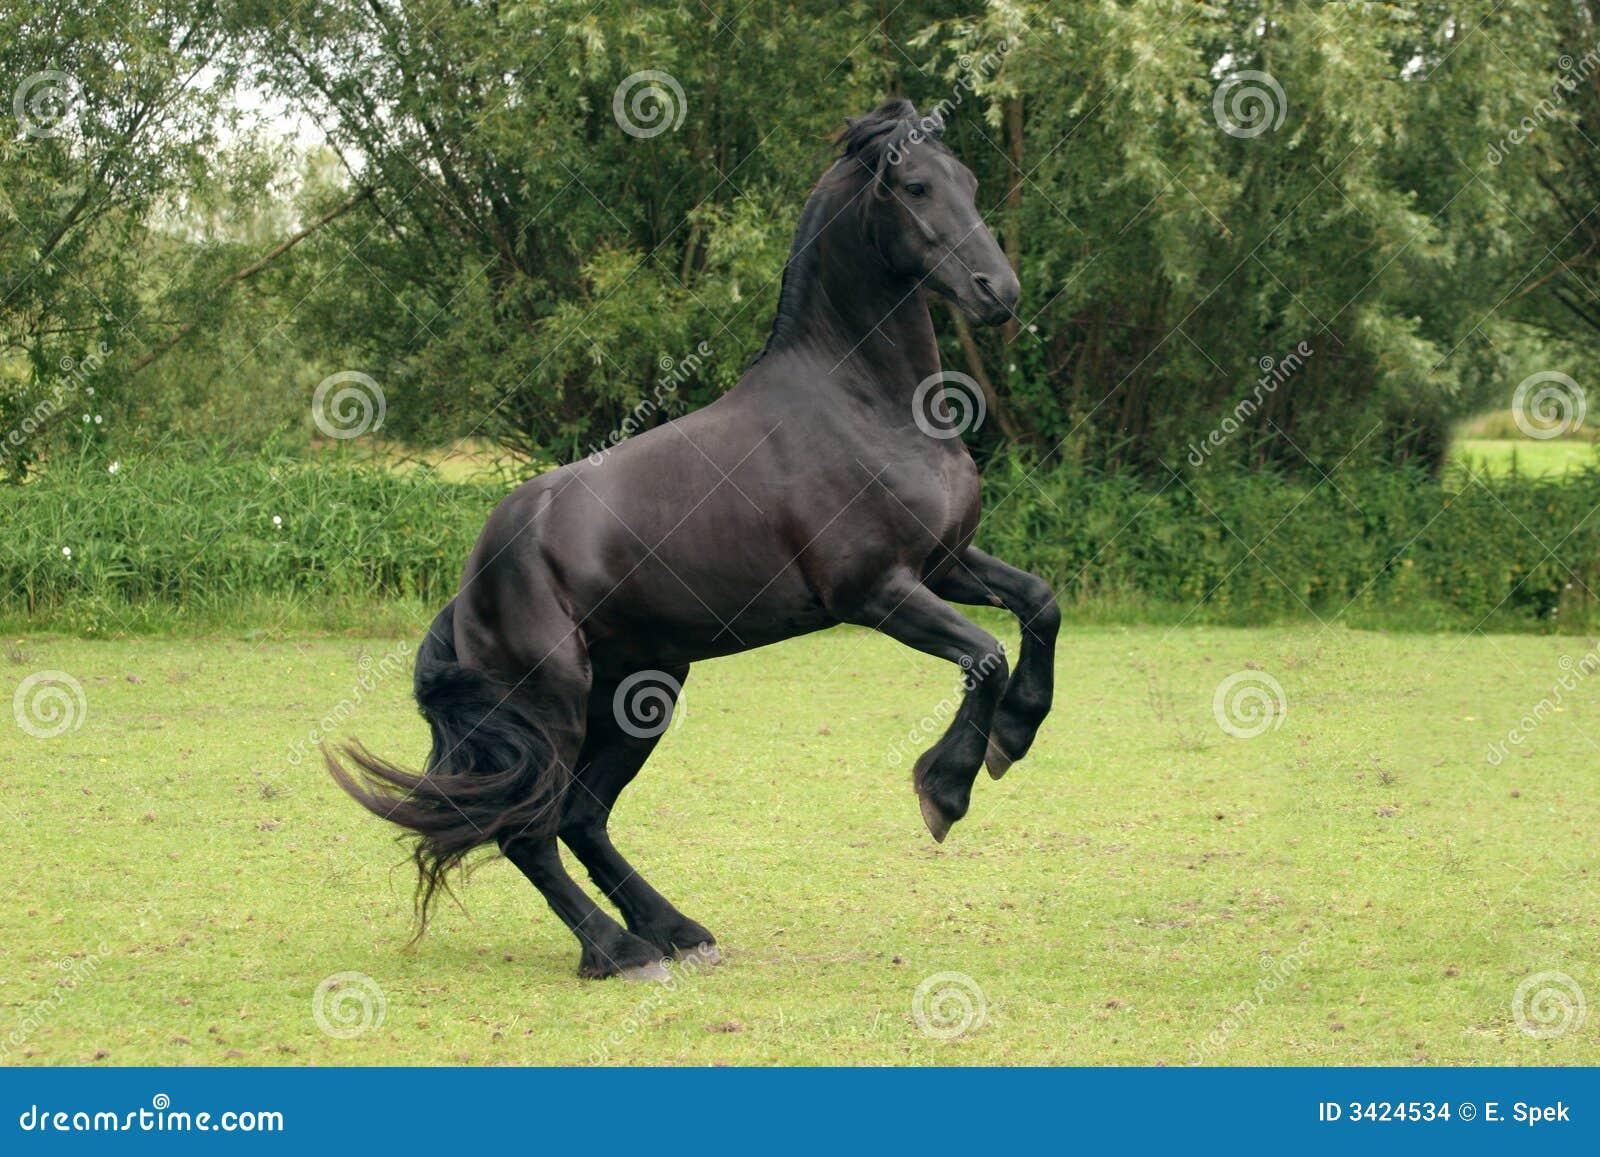 Rearing Black Horse Stock Images - Image: 3424534